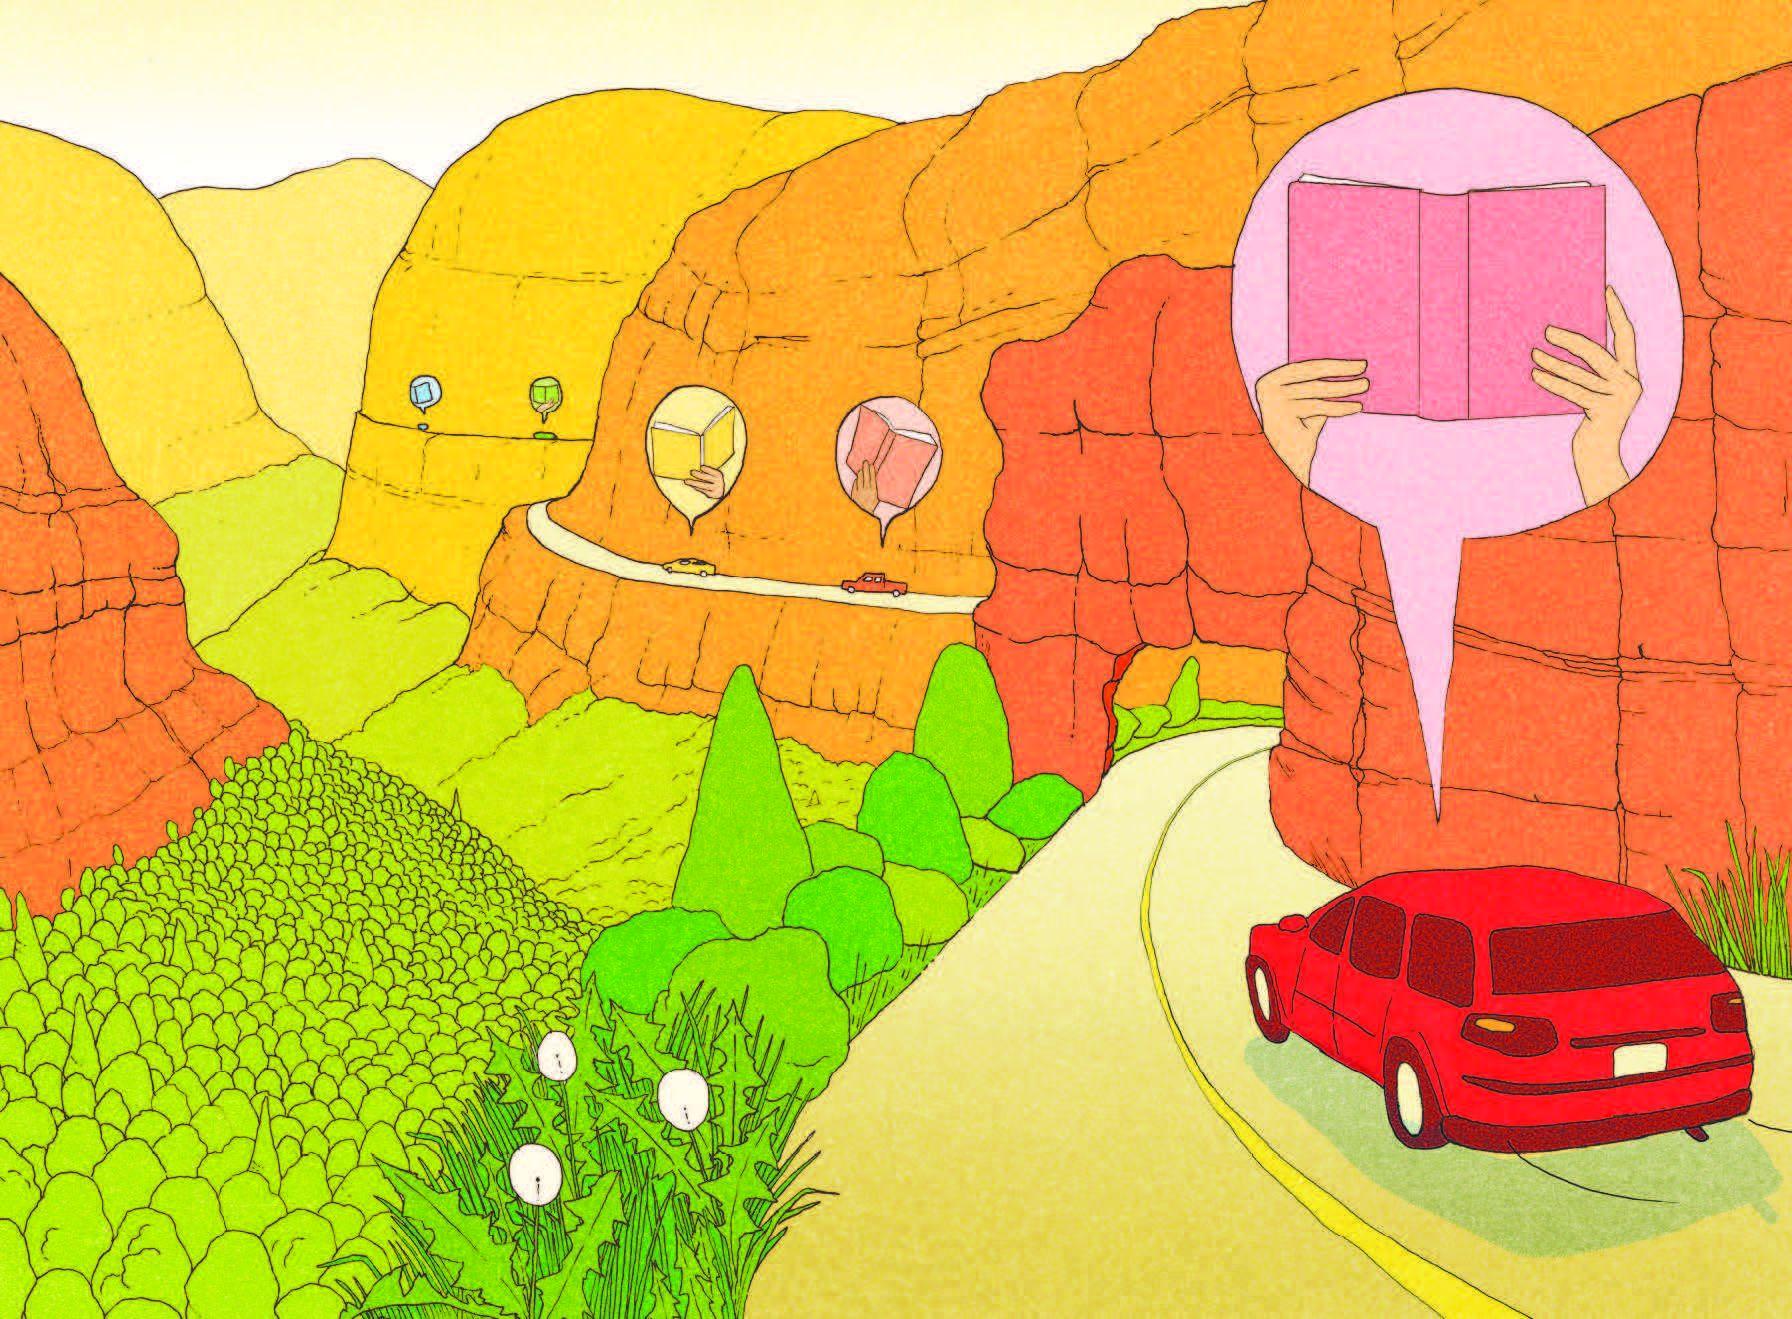 garance-illustration-Emma-Roulette-Washington-Post-Best-Audio-Books-On-a-Car-Trip